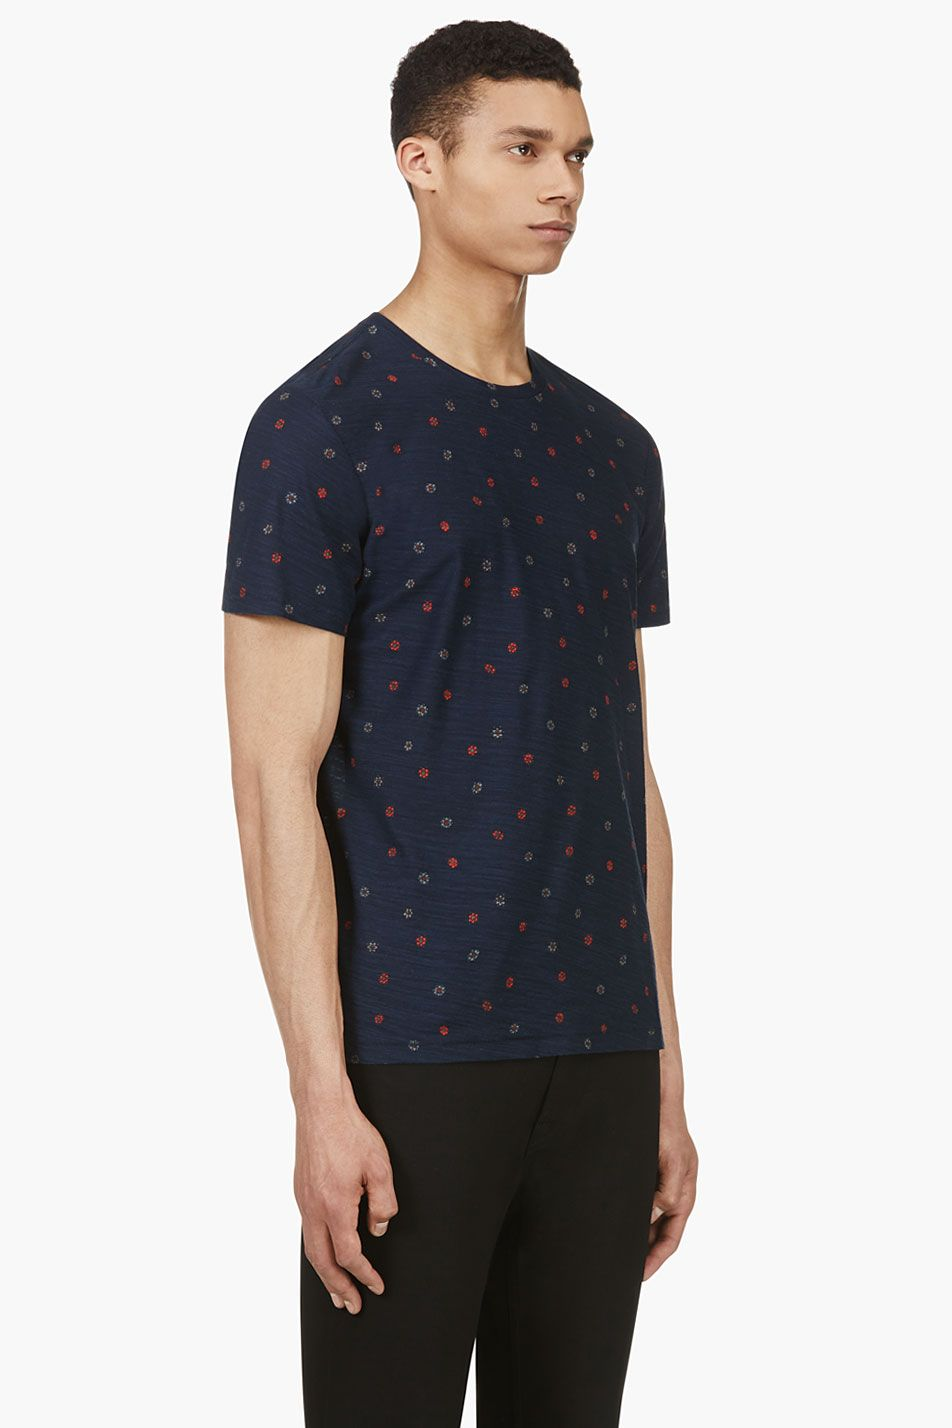 Rag Bone Navy Red Floral Polka Dot T Shirt Mens Shirts